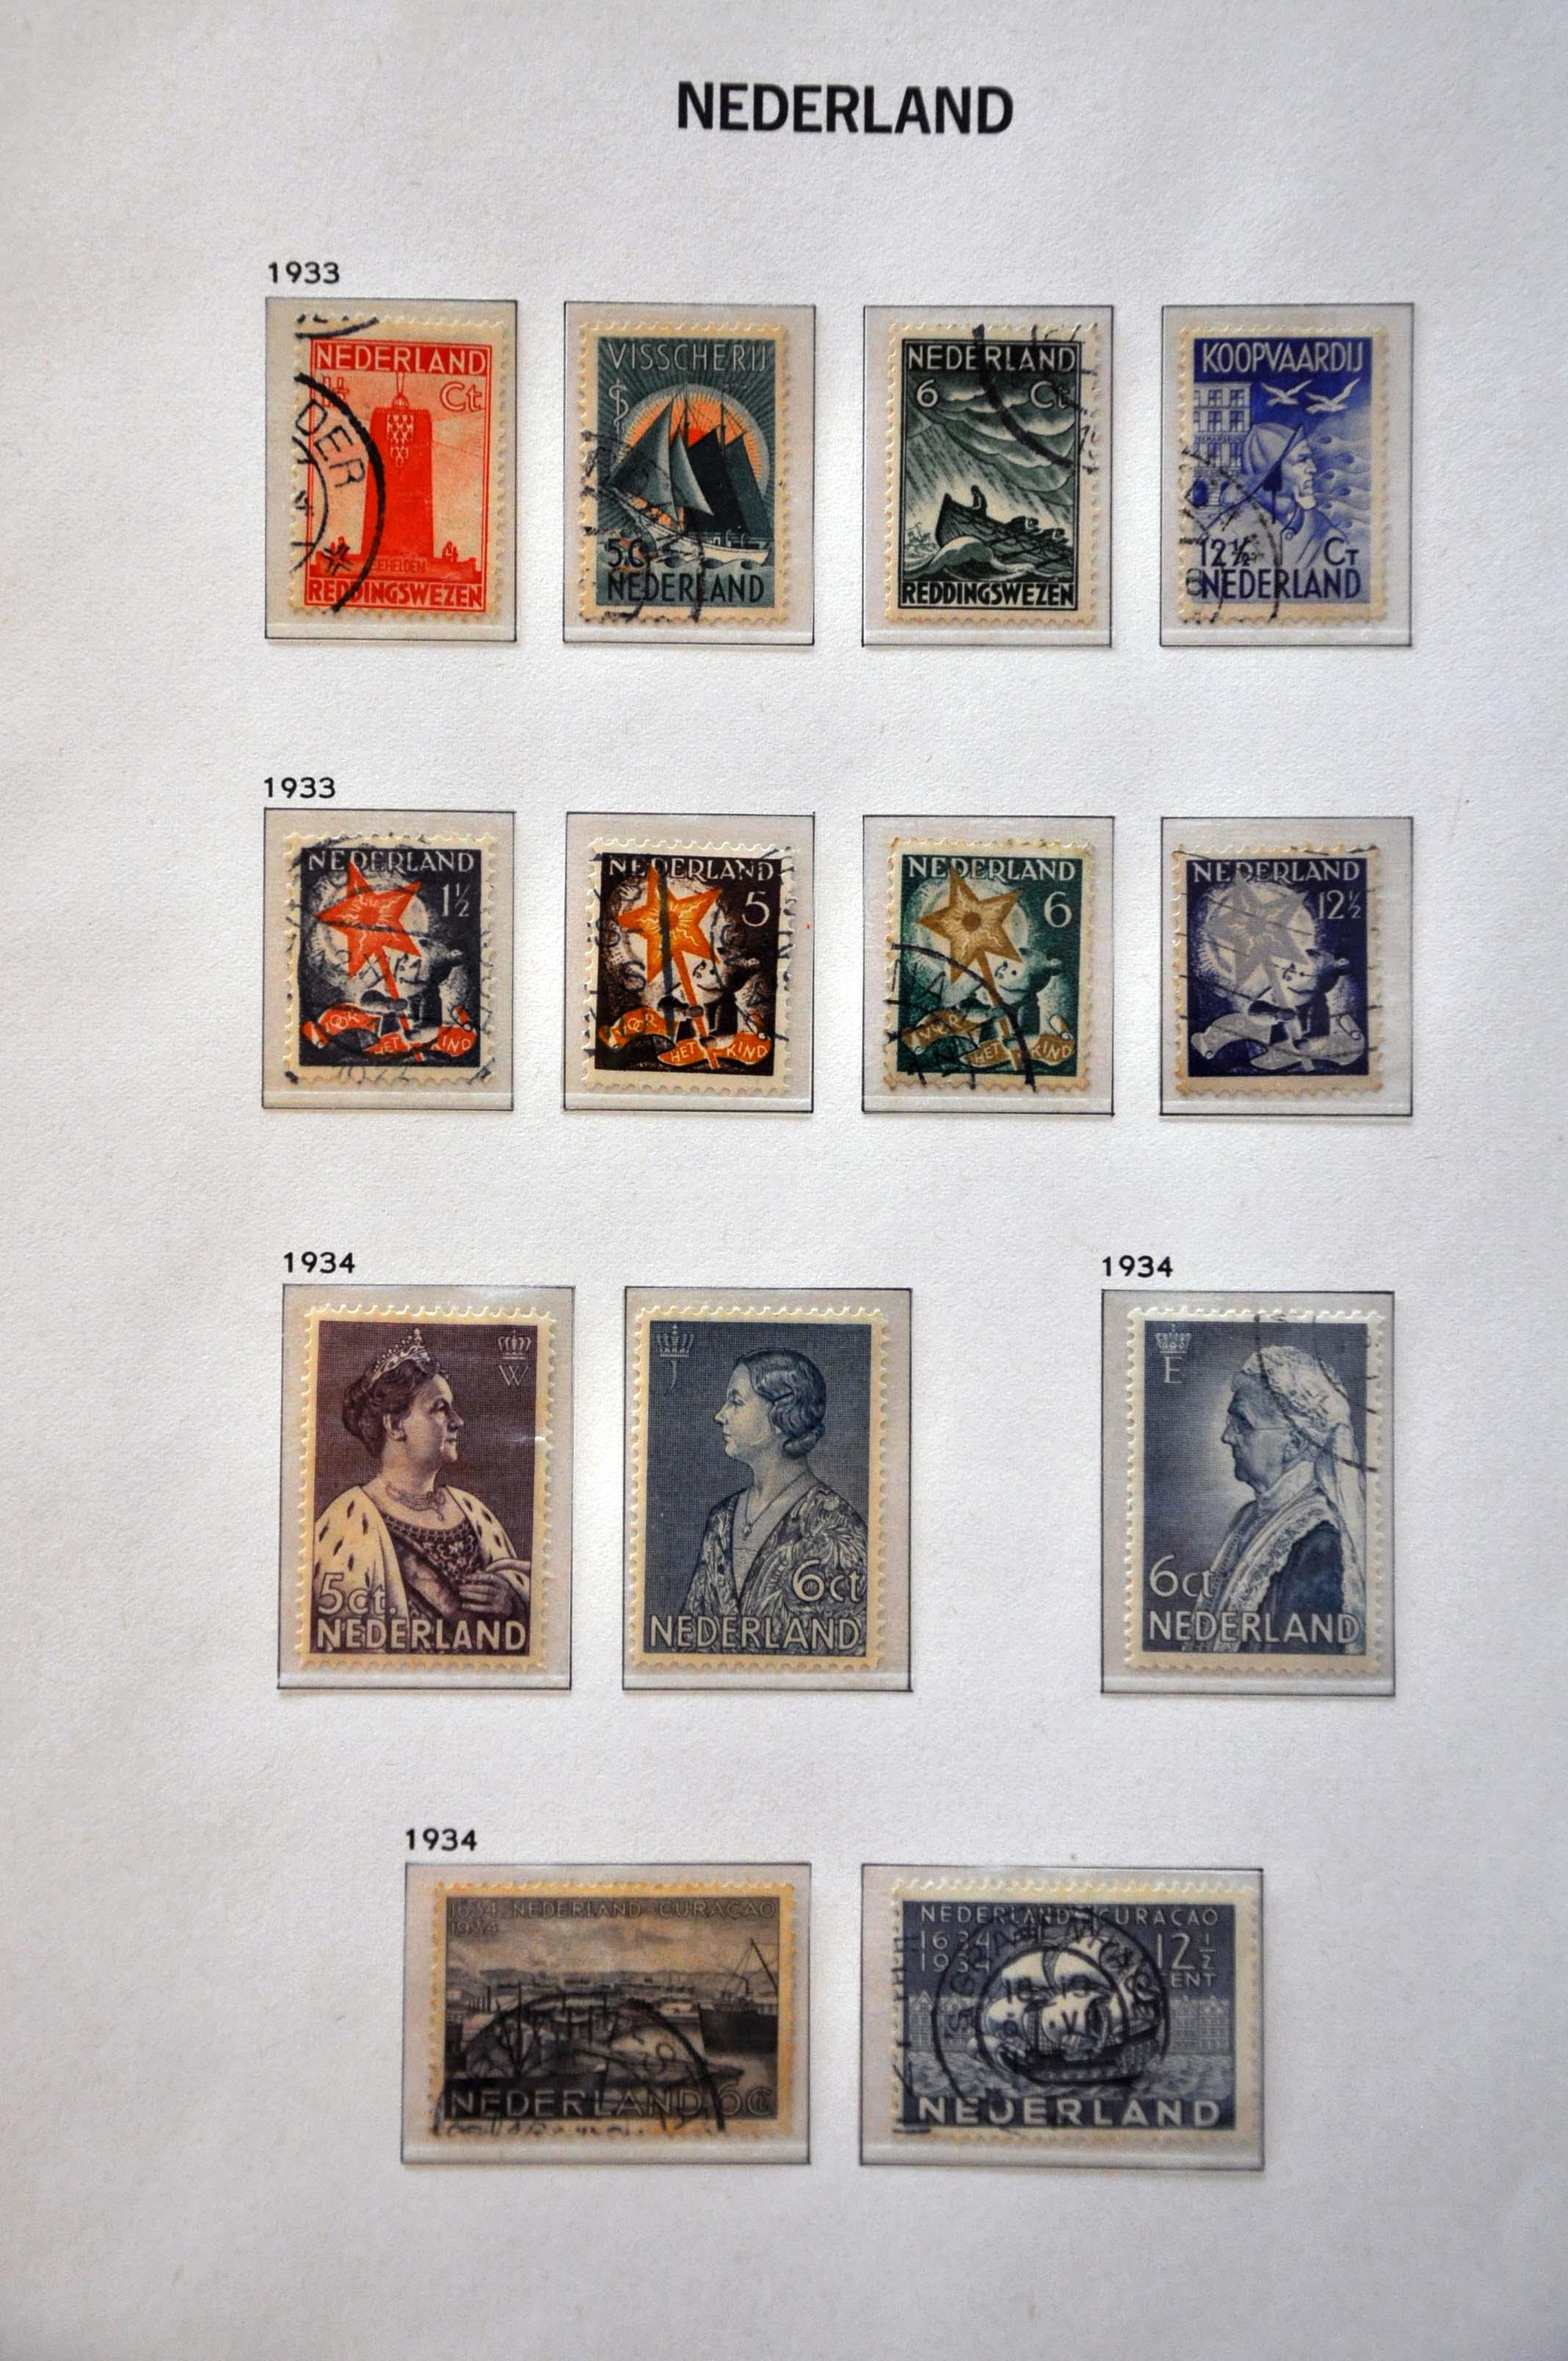 Lot 1494 - Netherlands and former colonies Netherlands -  Corinphila Veilingen Auction 239: General sale